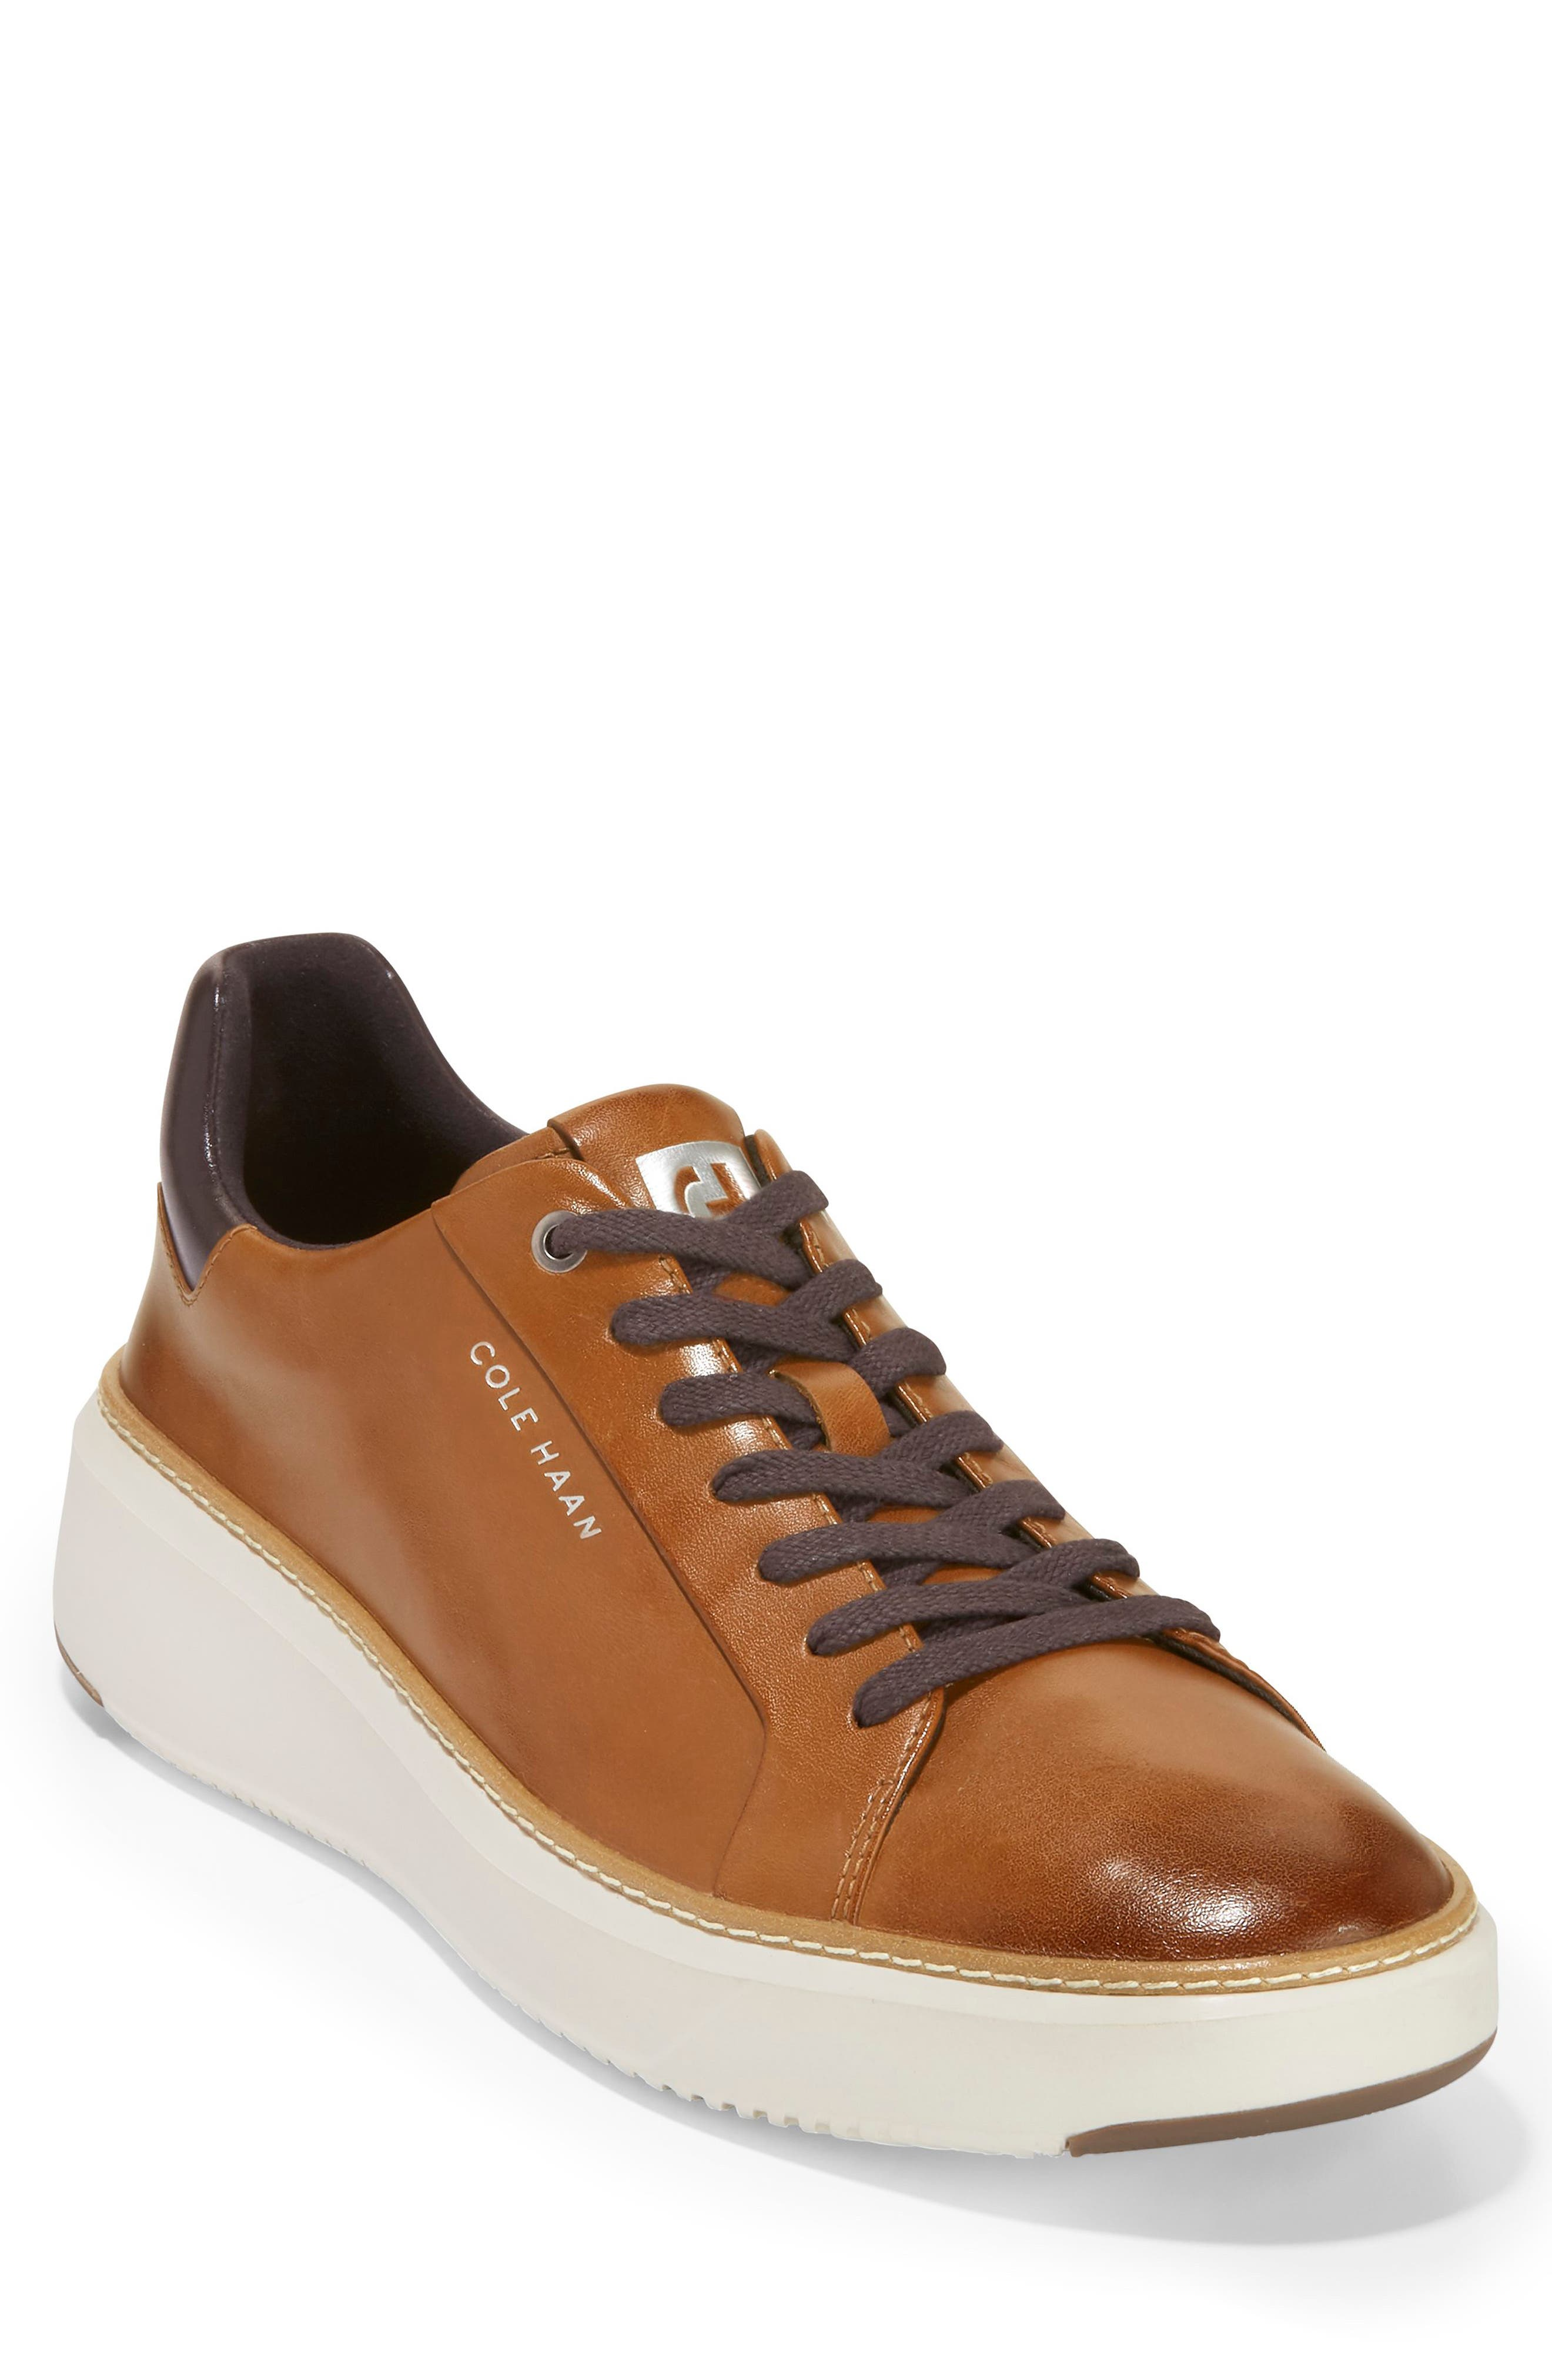 Grandpro Topspin Sneaker